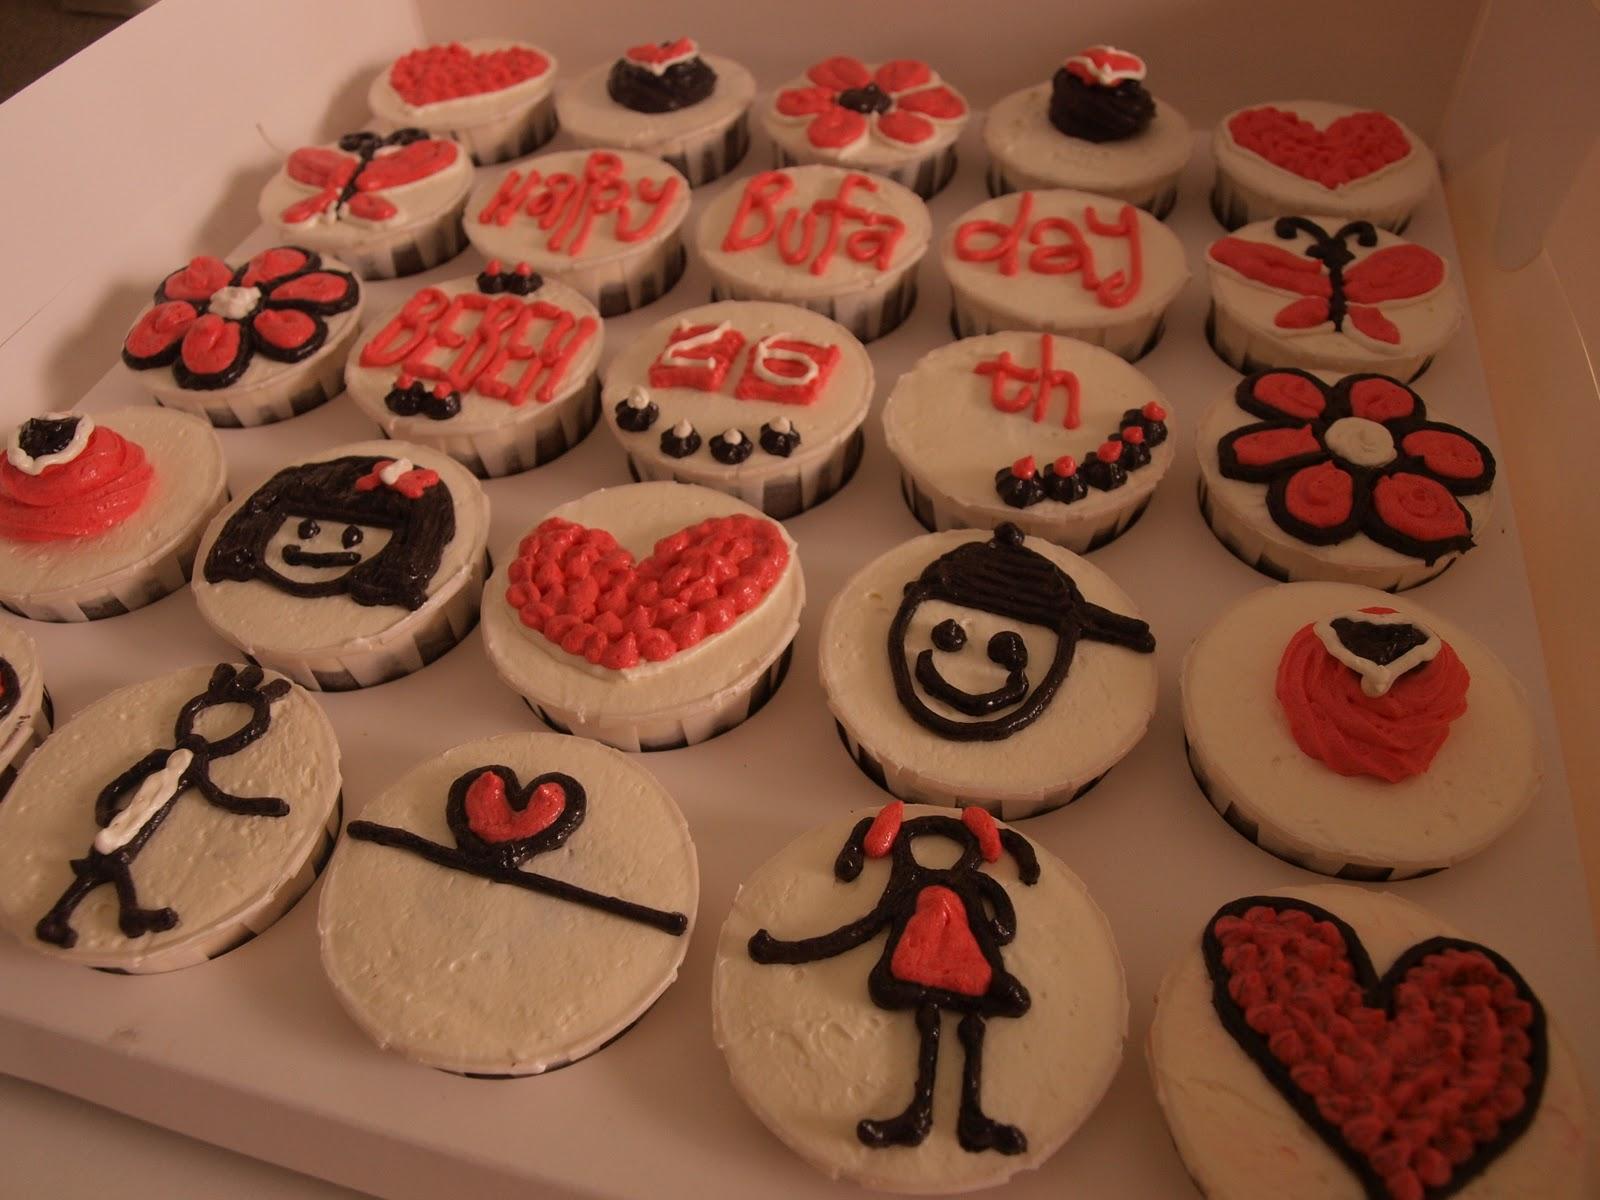 boyfriend cupcakes - photo #6